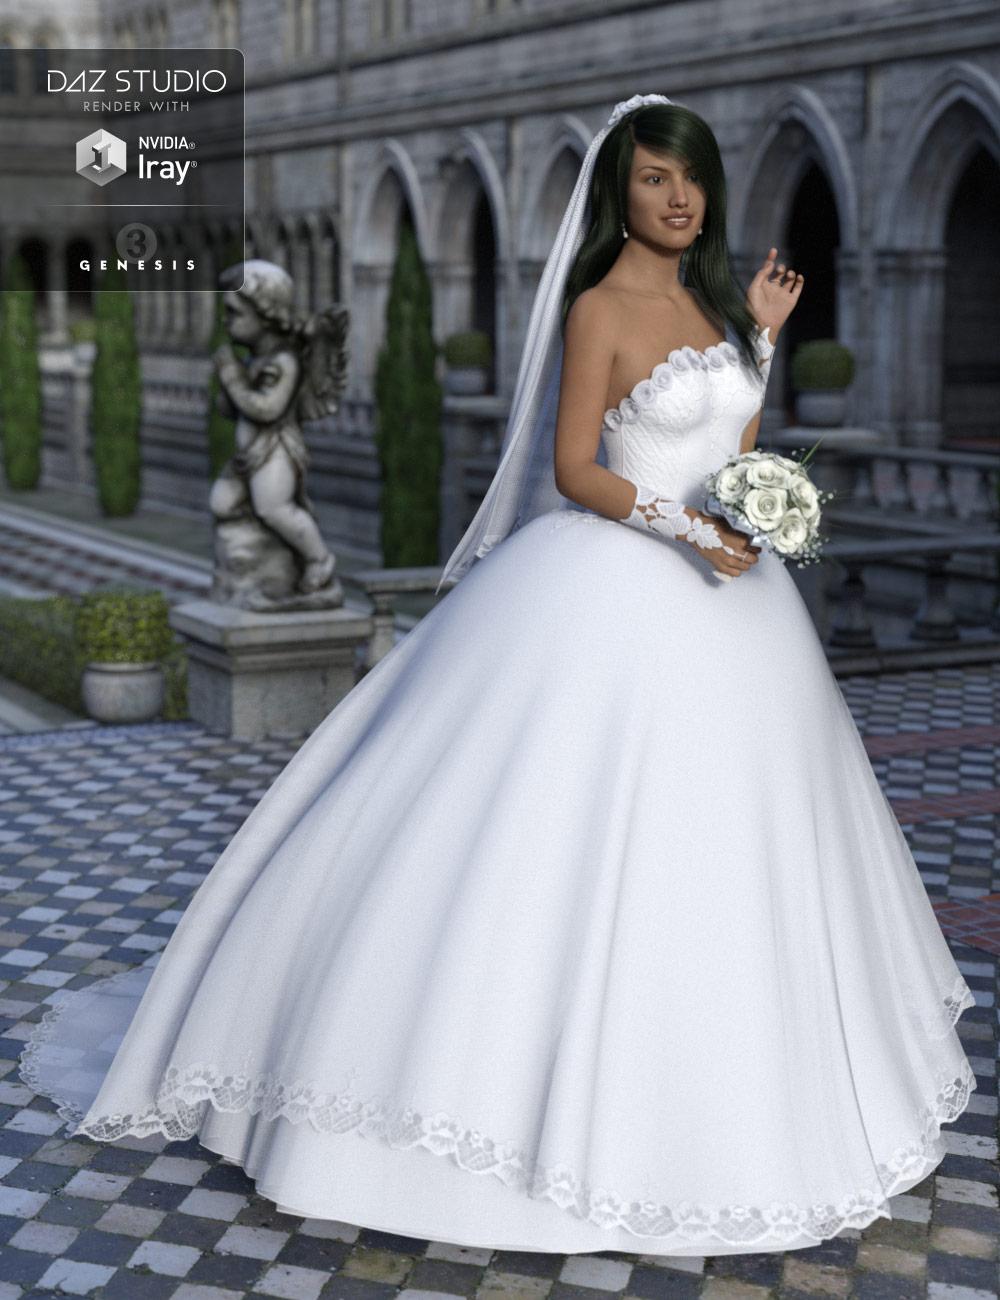 Wedding Dress for Genesis 3 Female(s) by: ile-avalon, 3D Models by Daz 3D